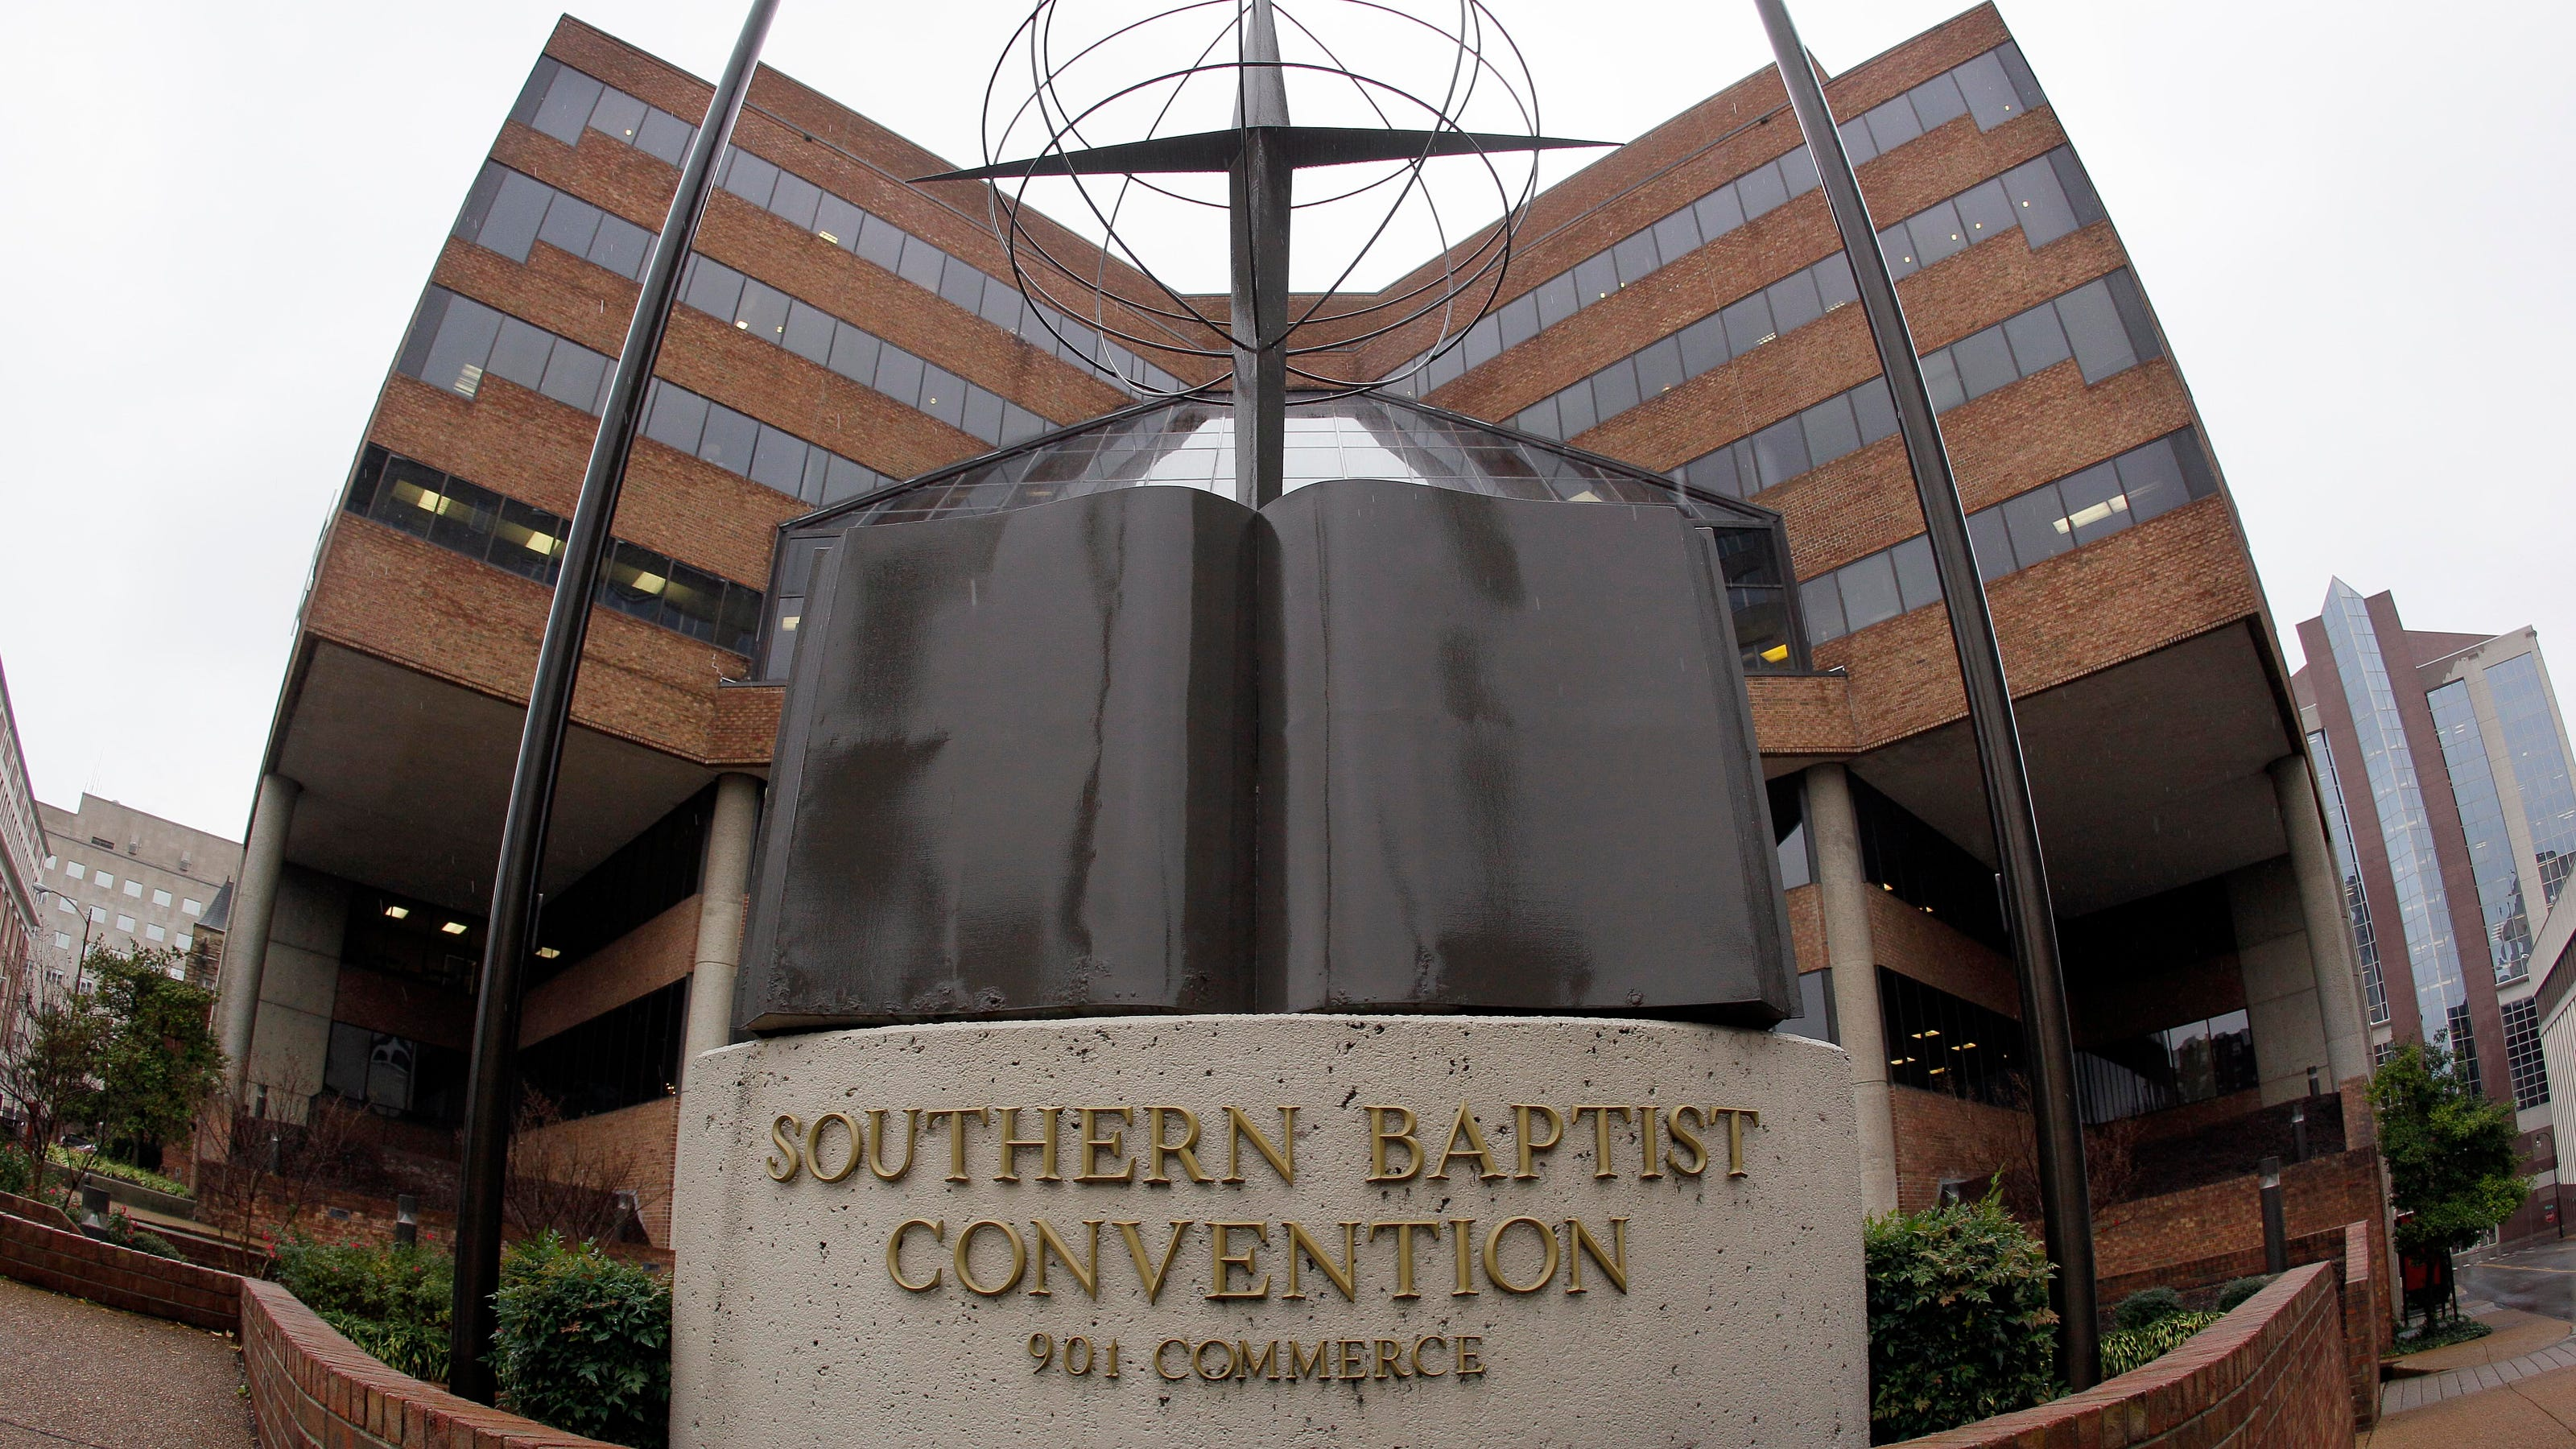 southernbaptists jpg?width=3200&height=1800&fit=crop&format=pjpg&auto=webp.